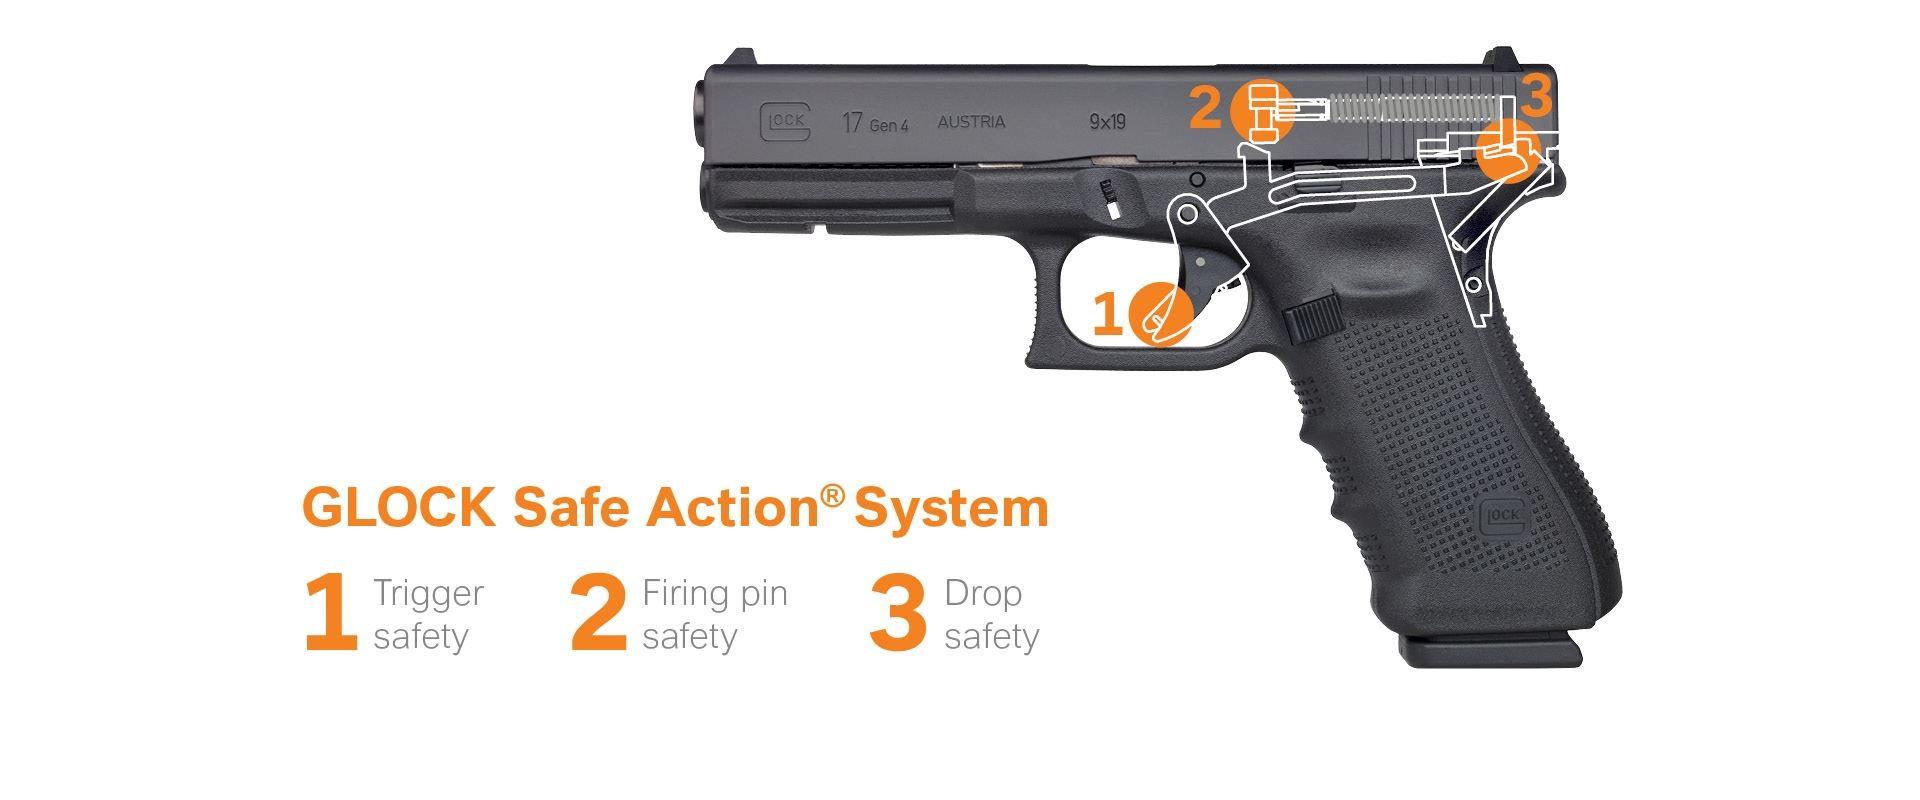 hight resolution of 40 glock schematic diagram